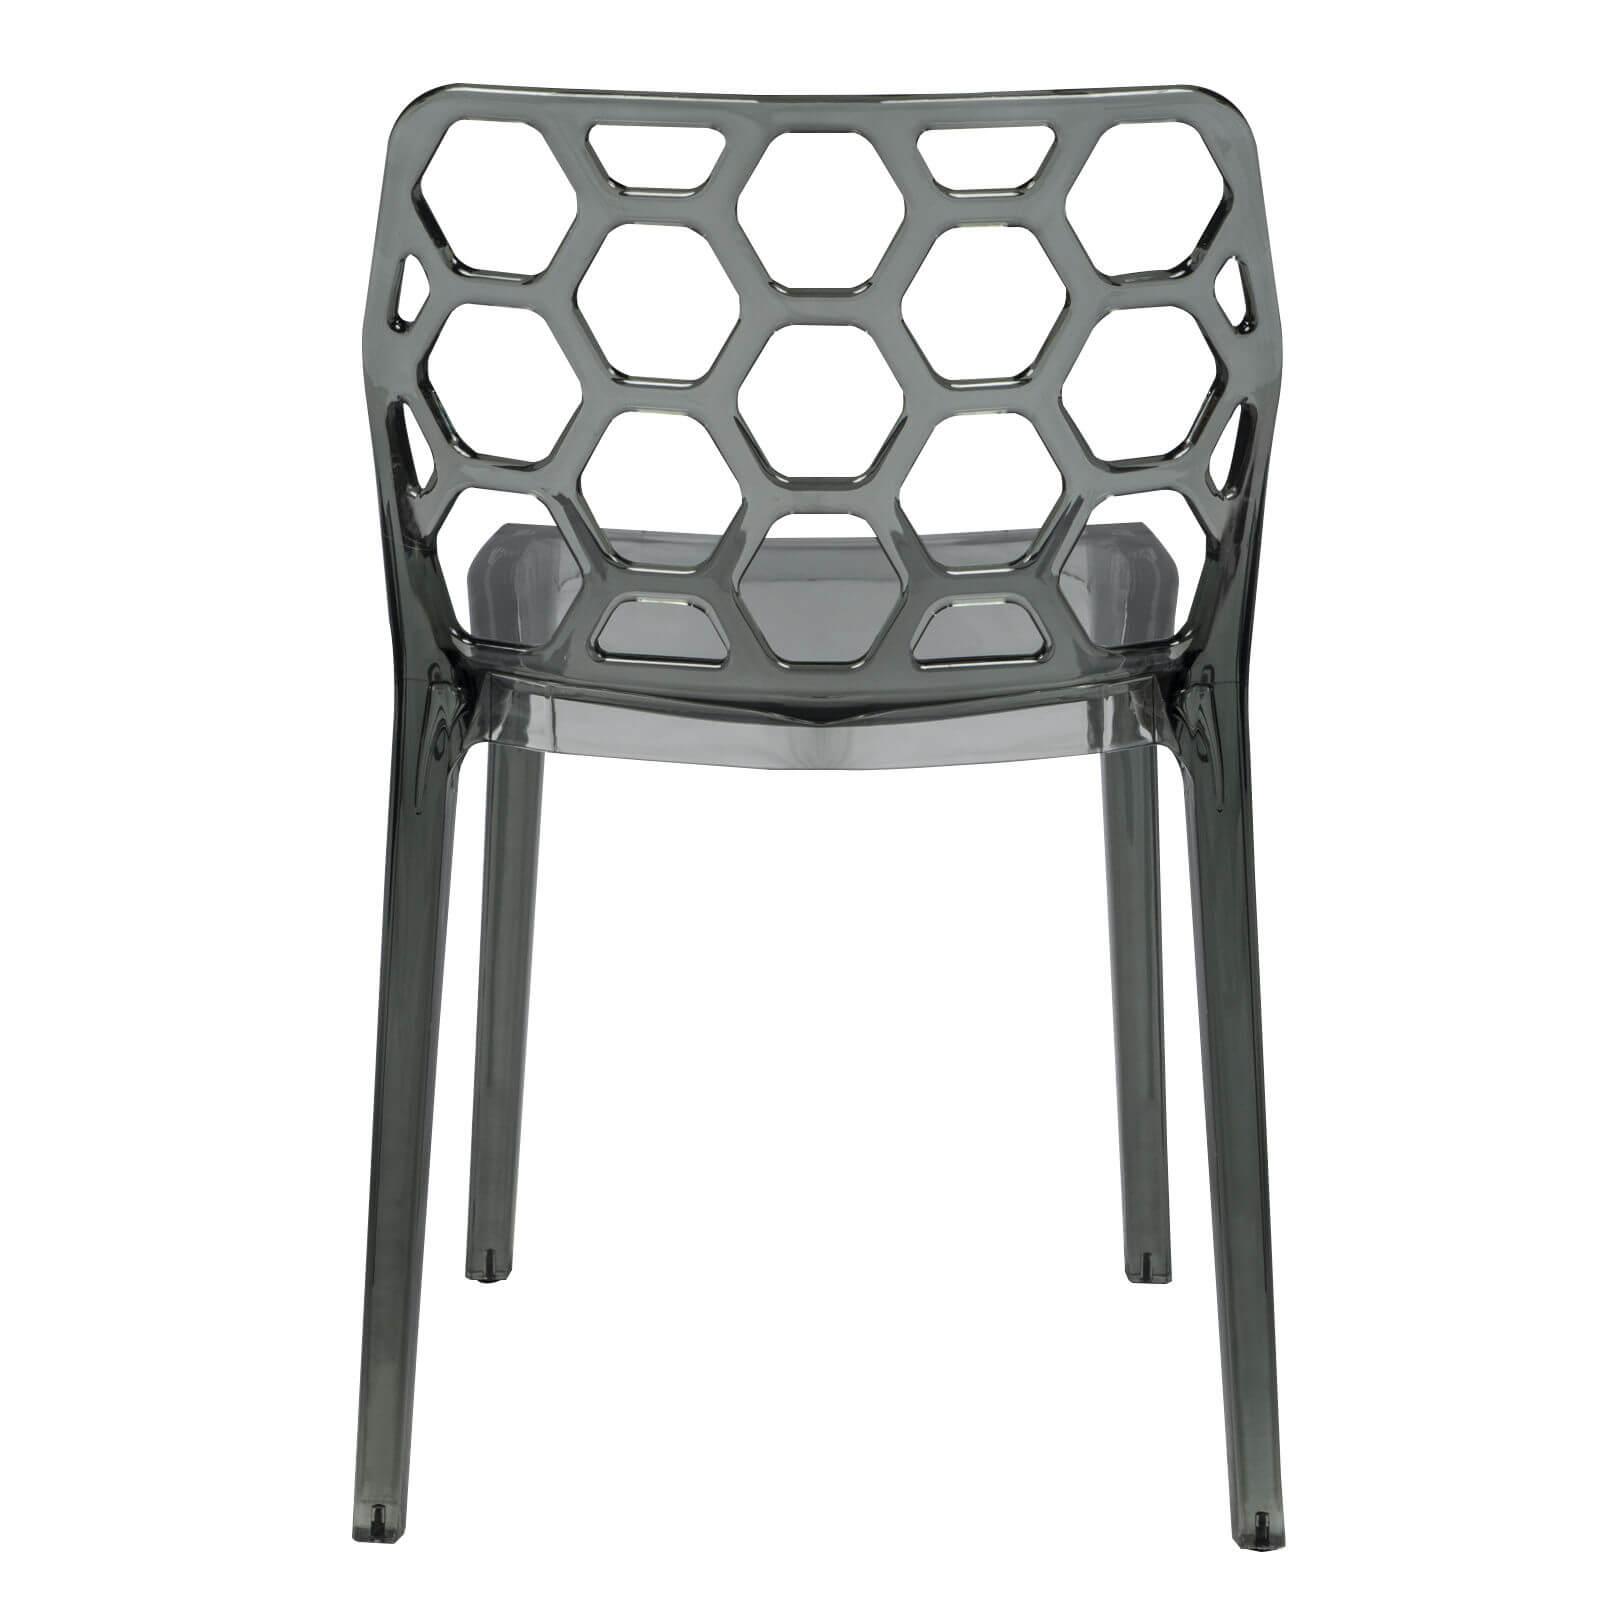 Geometric chair black transparent 4